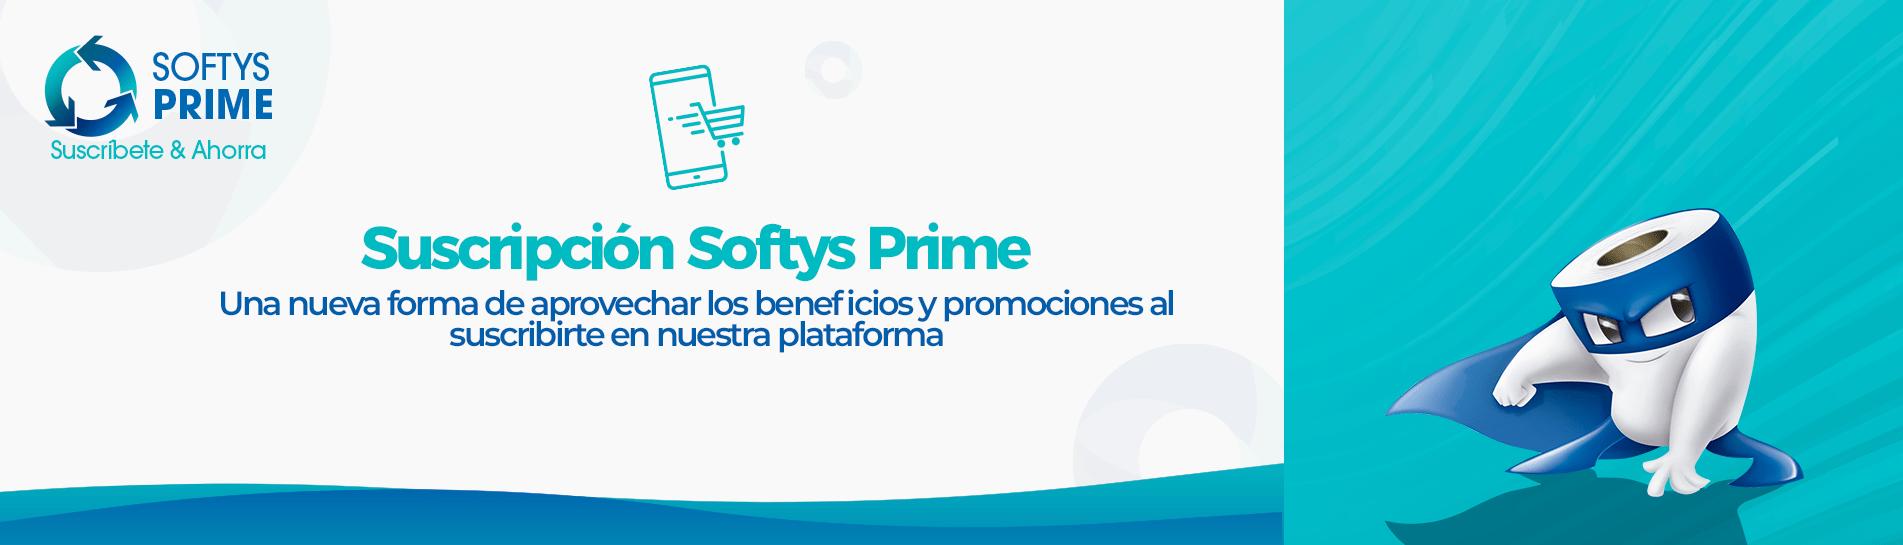 Softys-prime